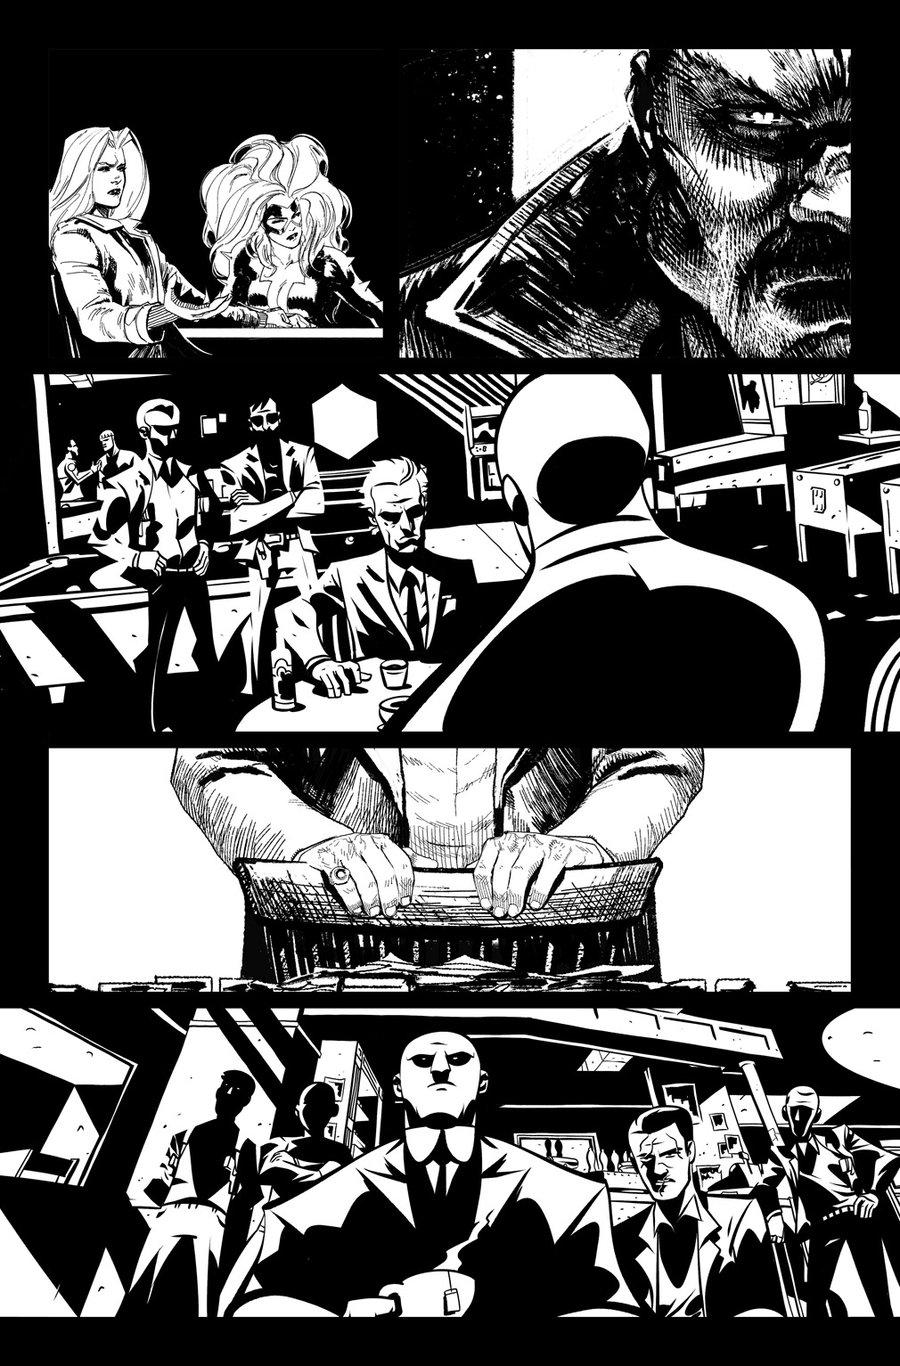 Image of DEFENDERS #8, p.04 ARTIST'S PROOF